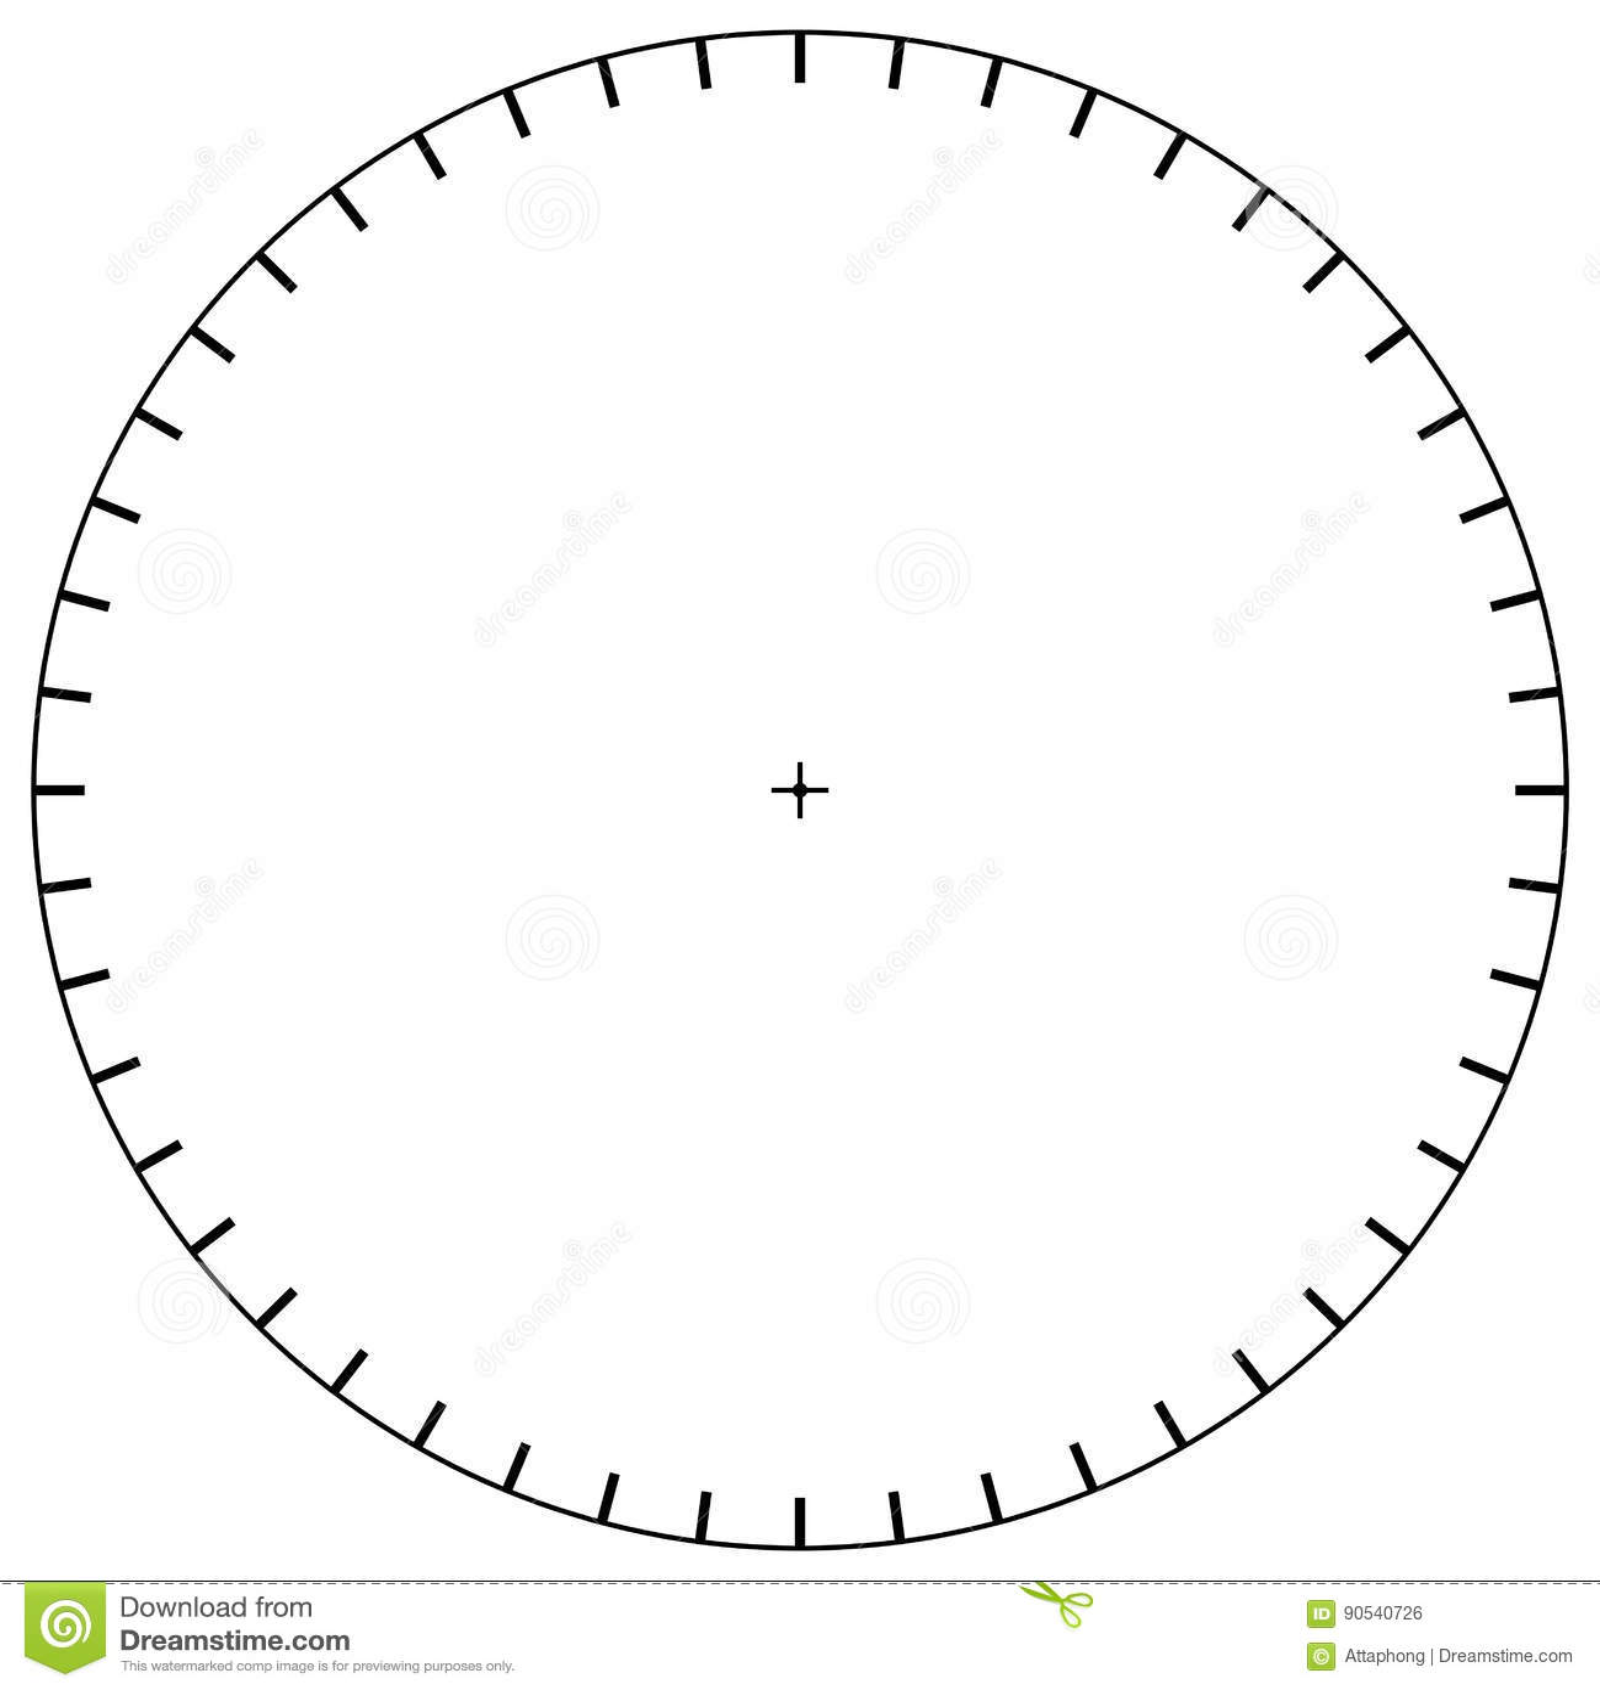 blank pie chart - gagnatashort.co